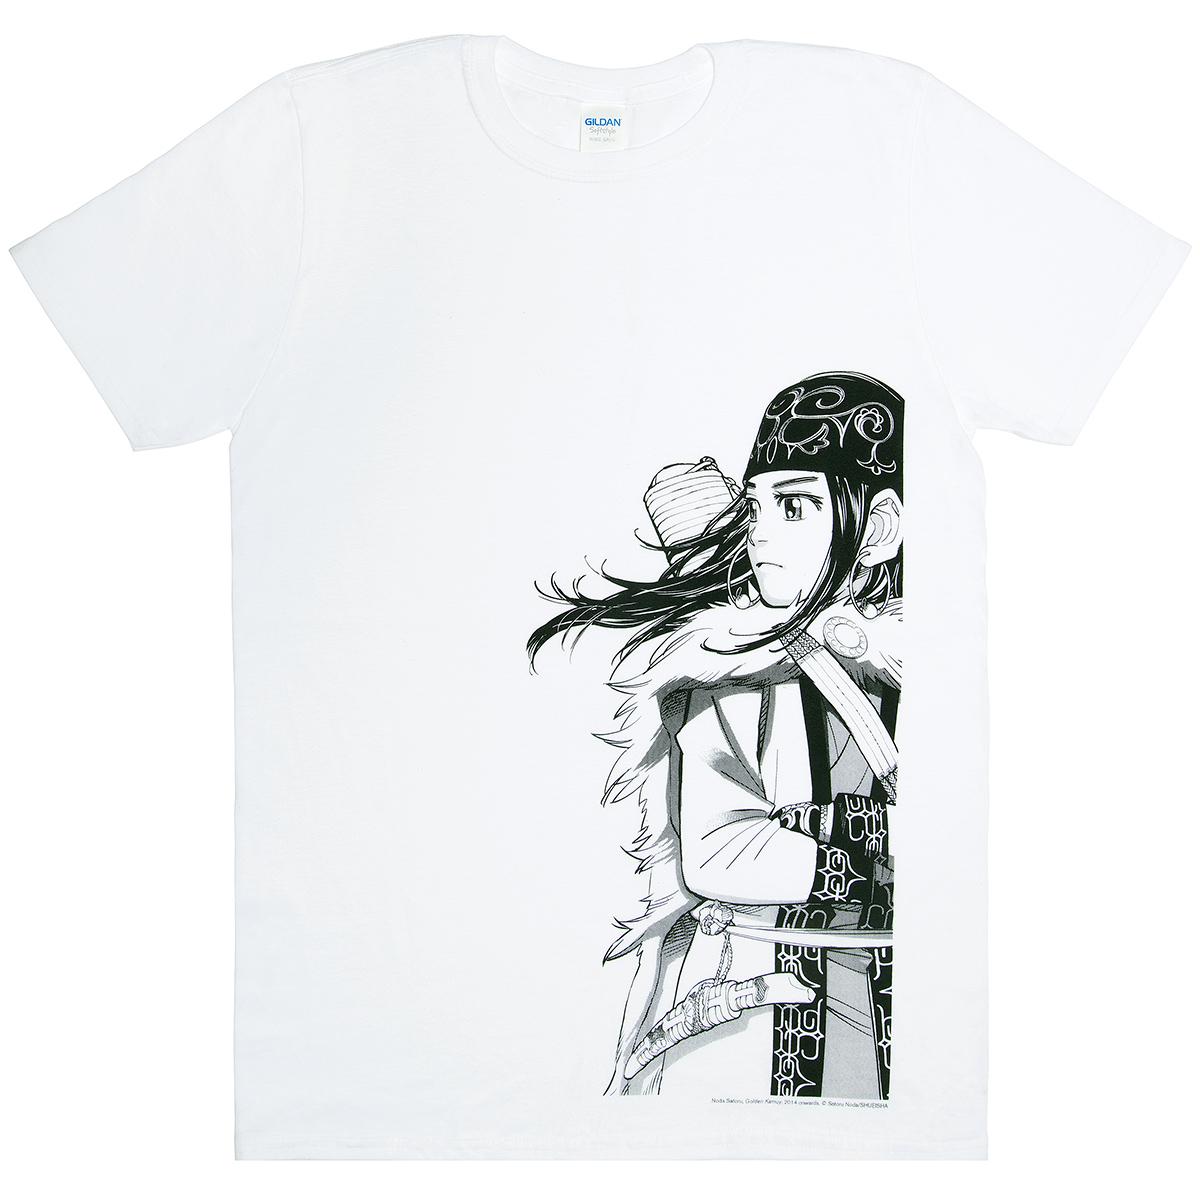 Golden Kamuy t-shirt (M)